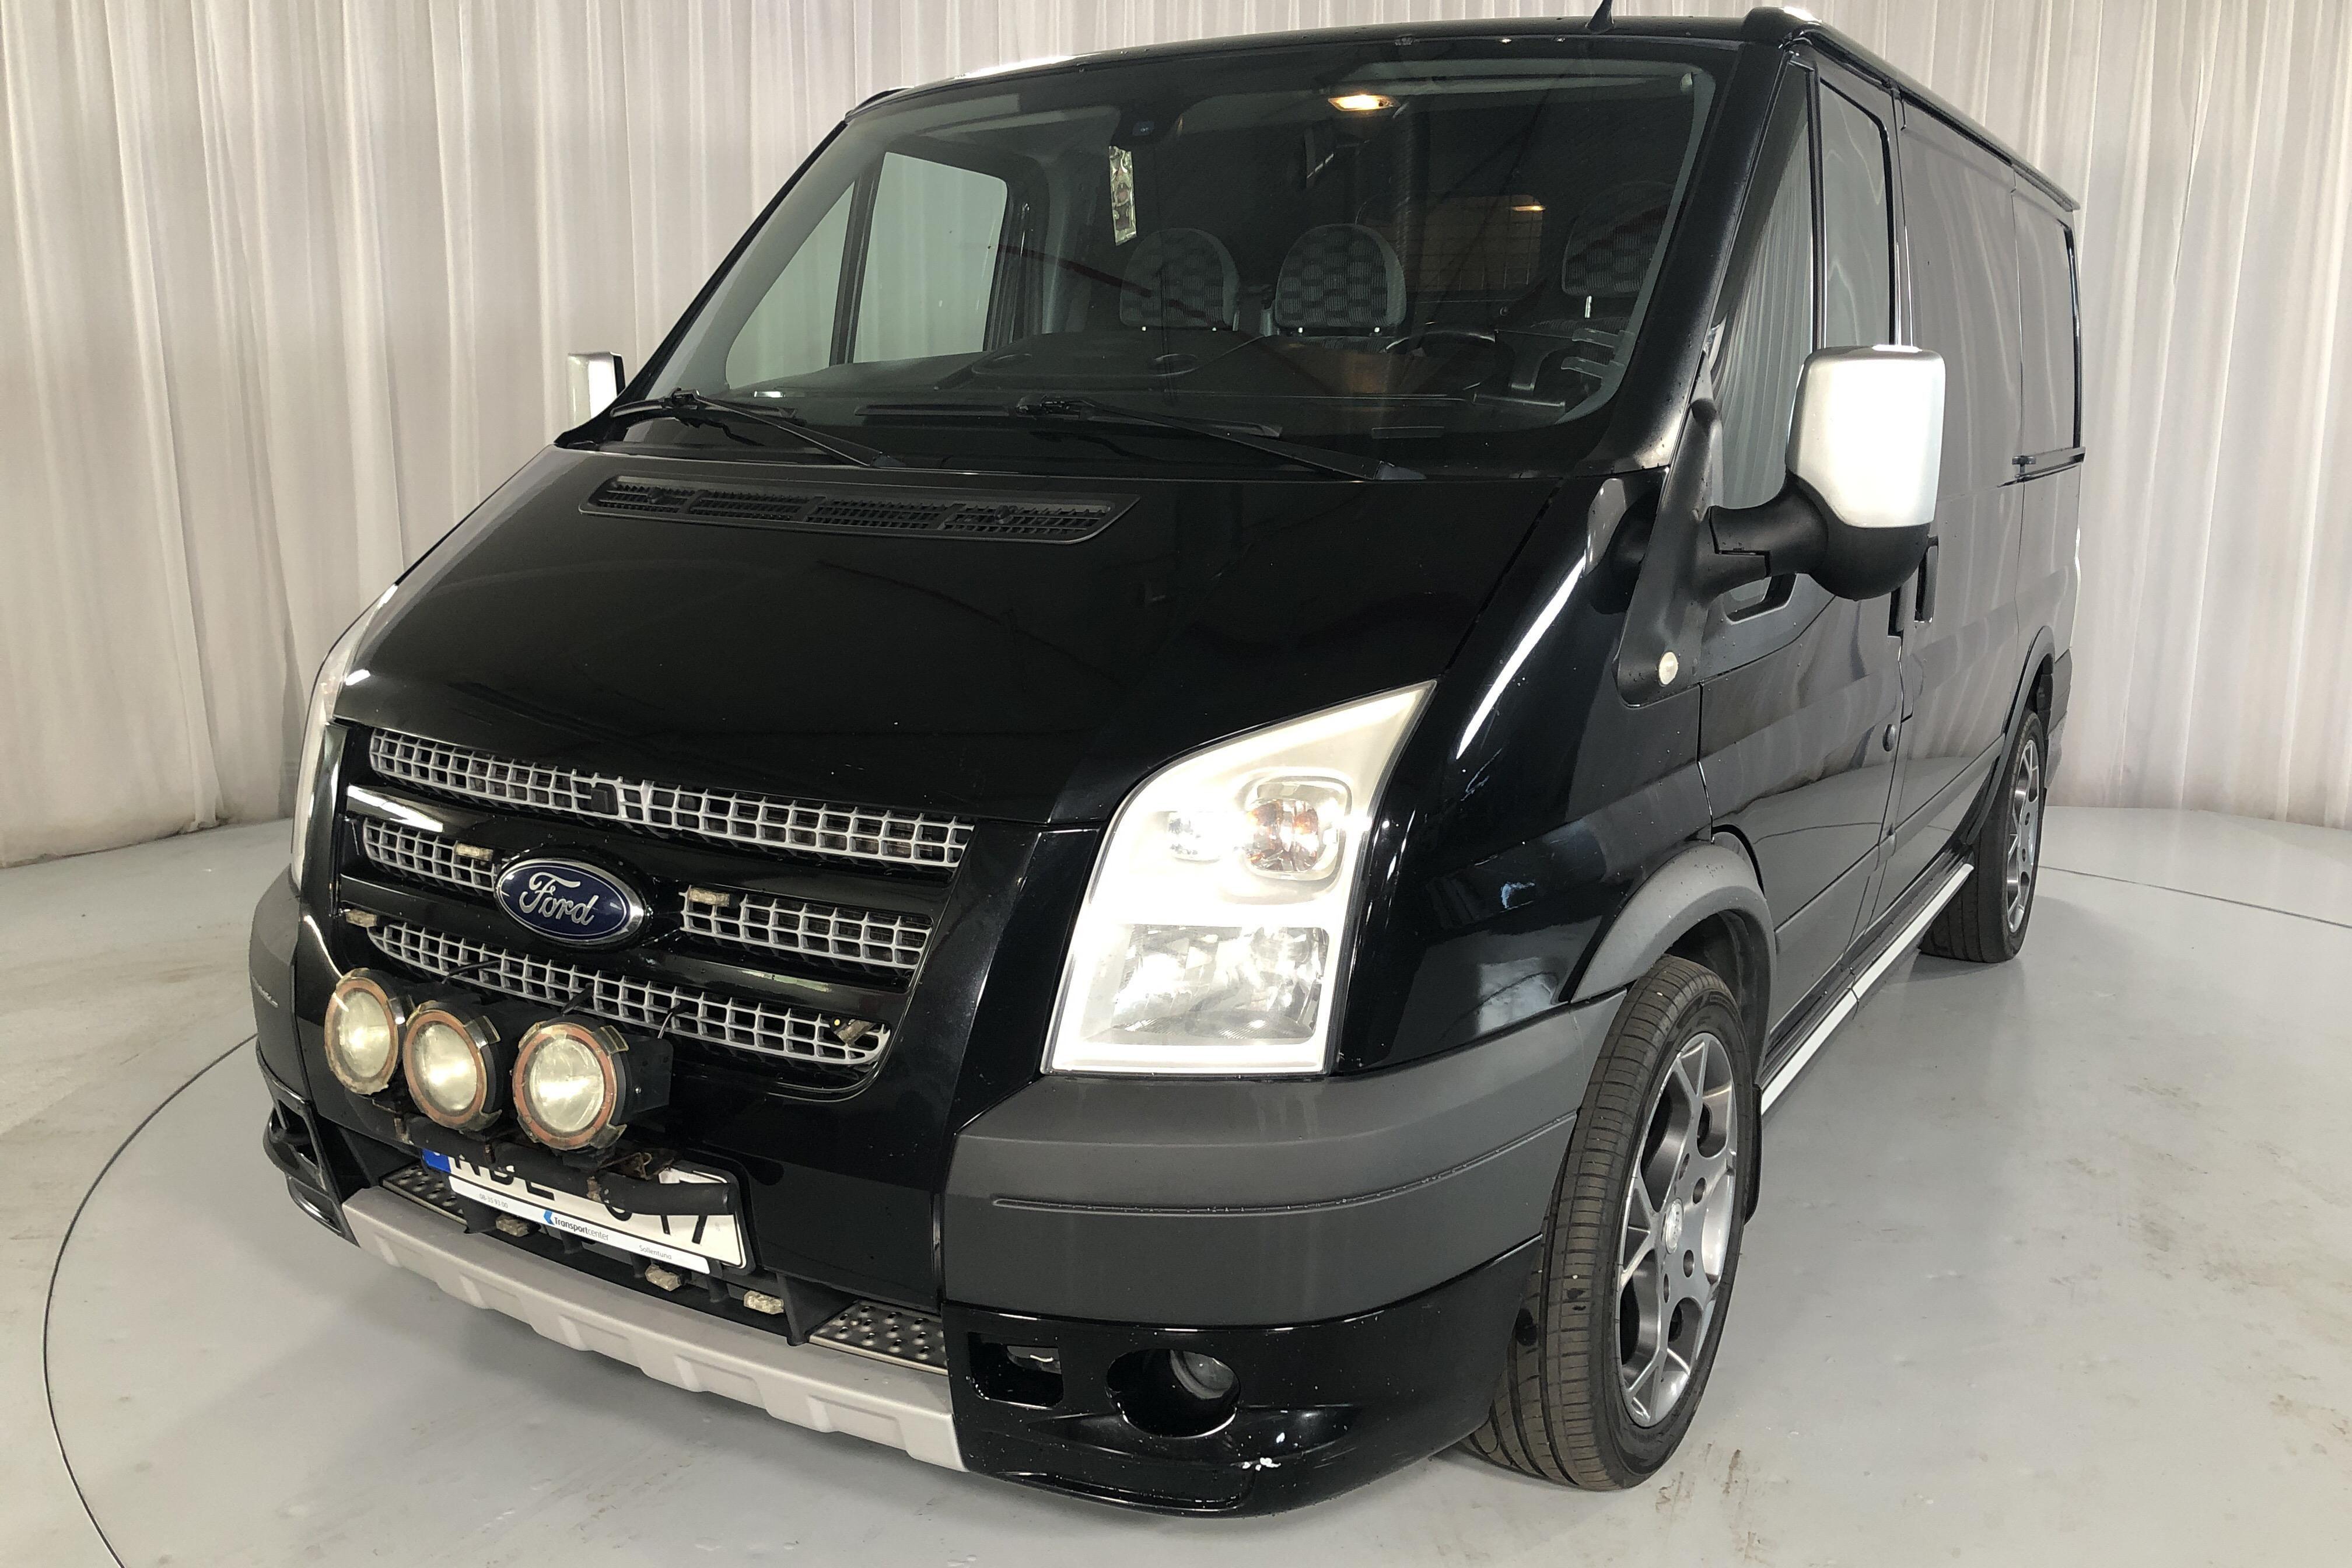 Ford Transit 260 2.2 TDCi SportVan (140 PS)